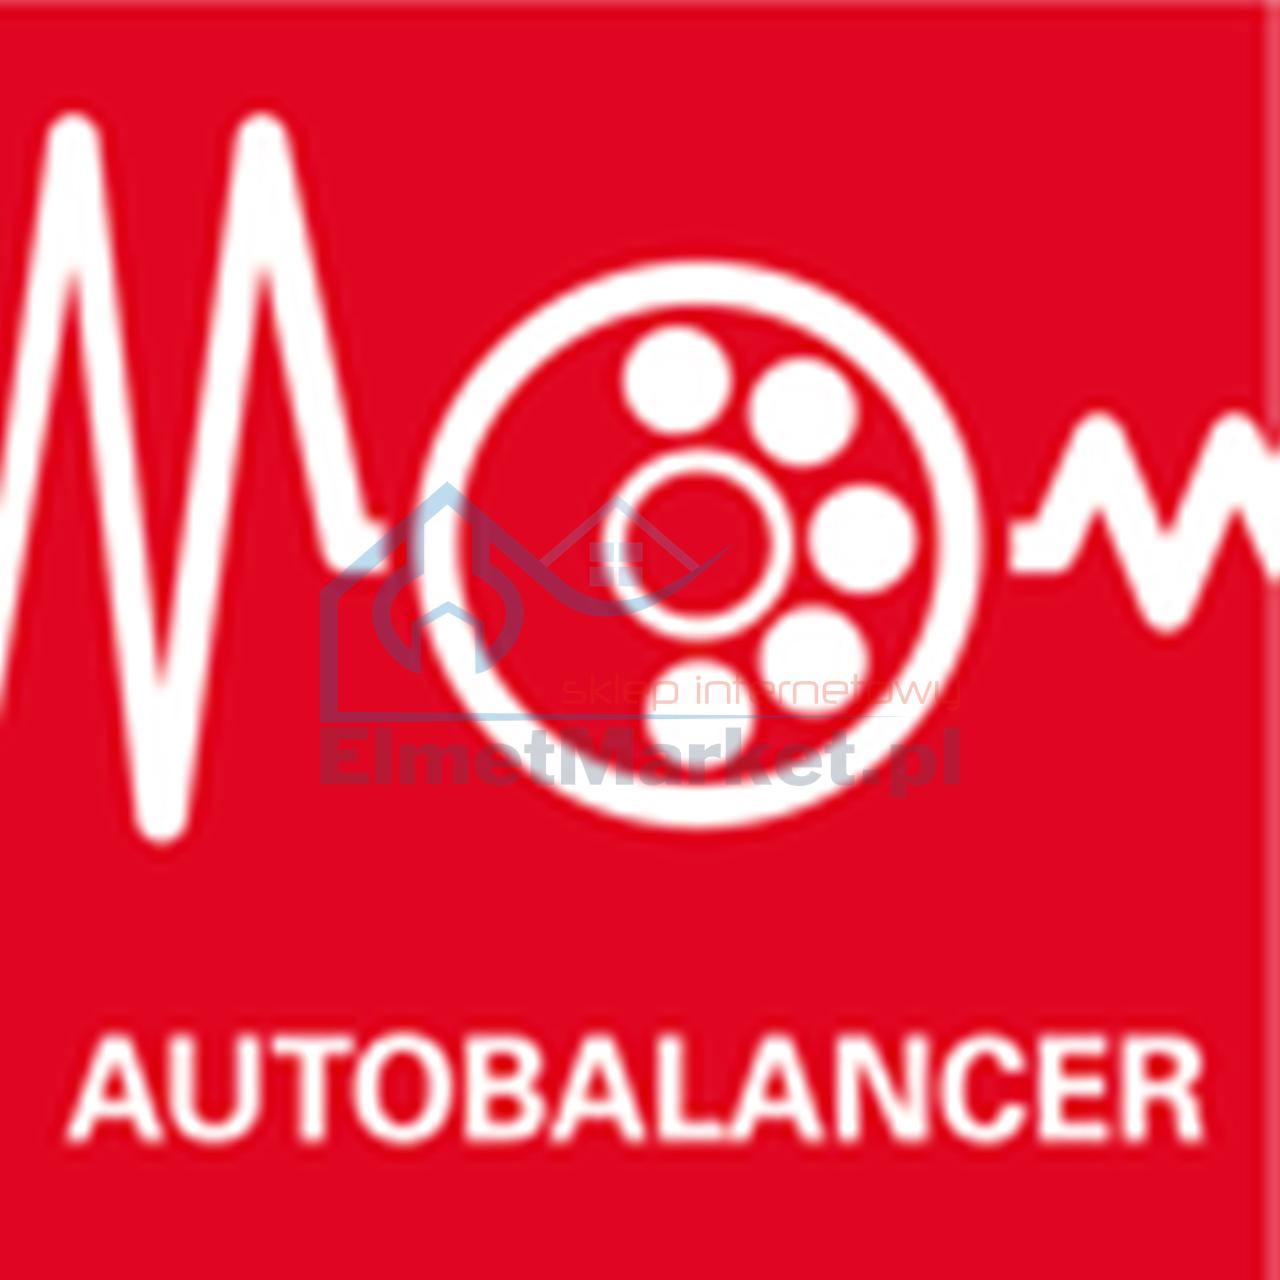 Autobalanser: